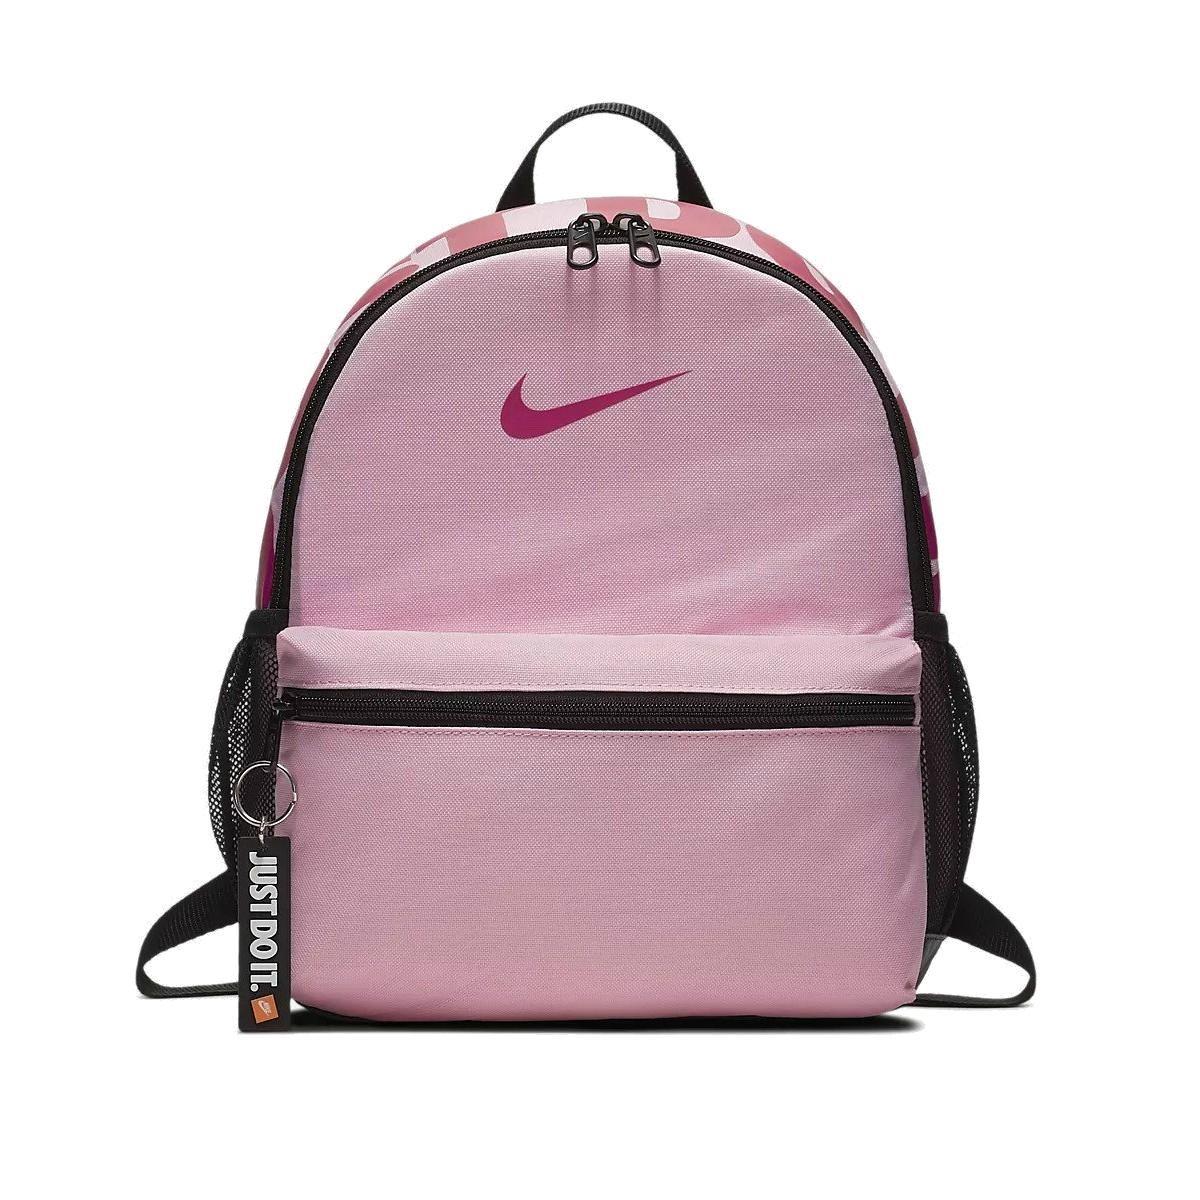 Mini Nike Ba5559 Infantil Jdi Mochila 654 Brasilia y6vIbf7Yg